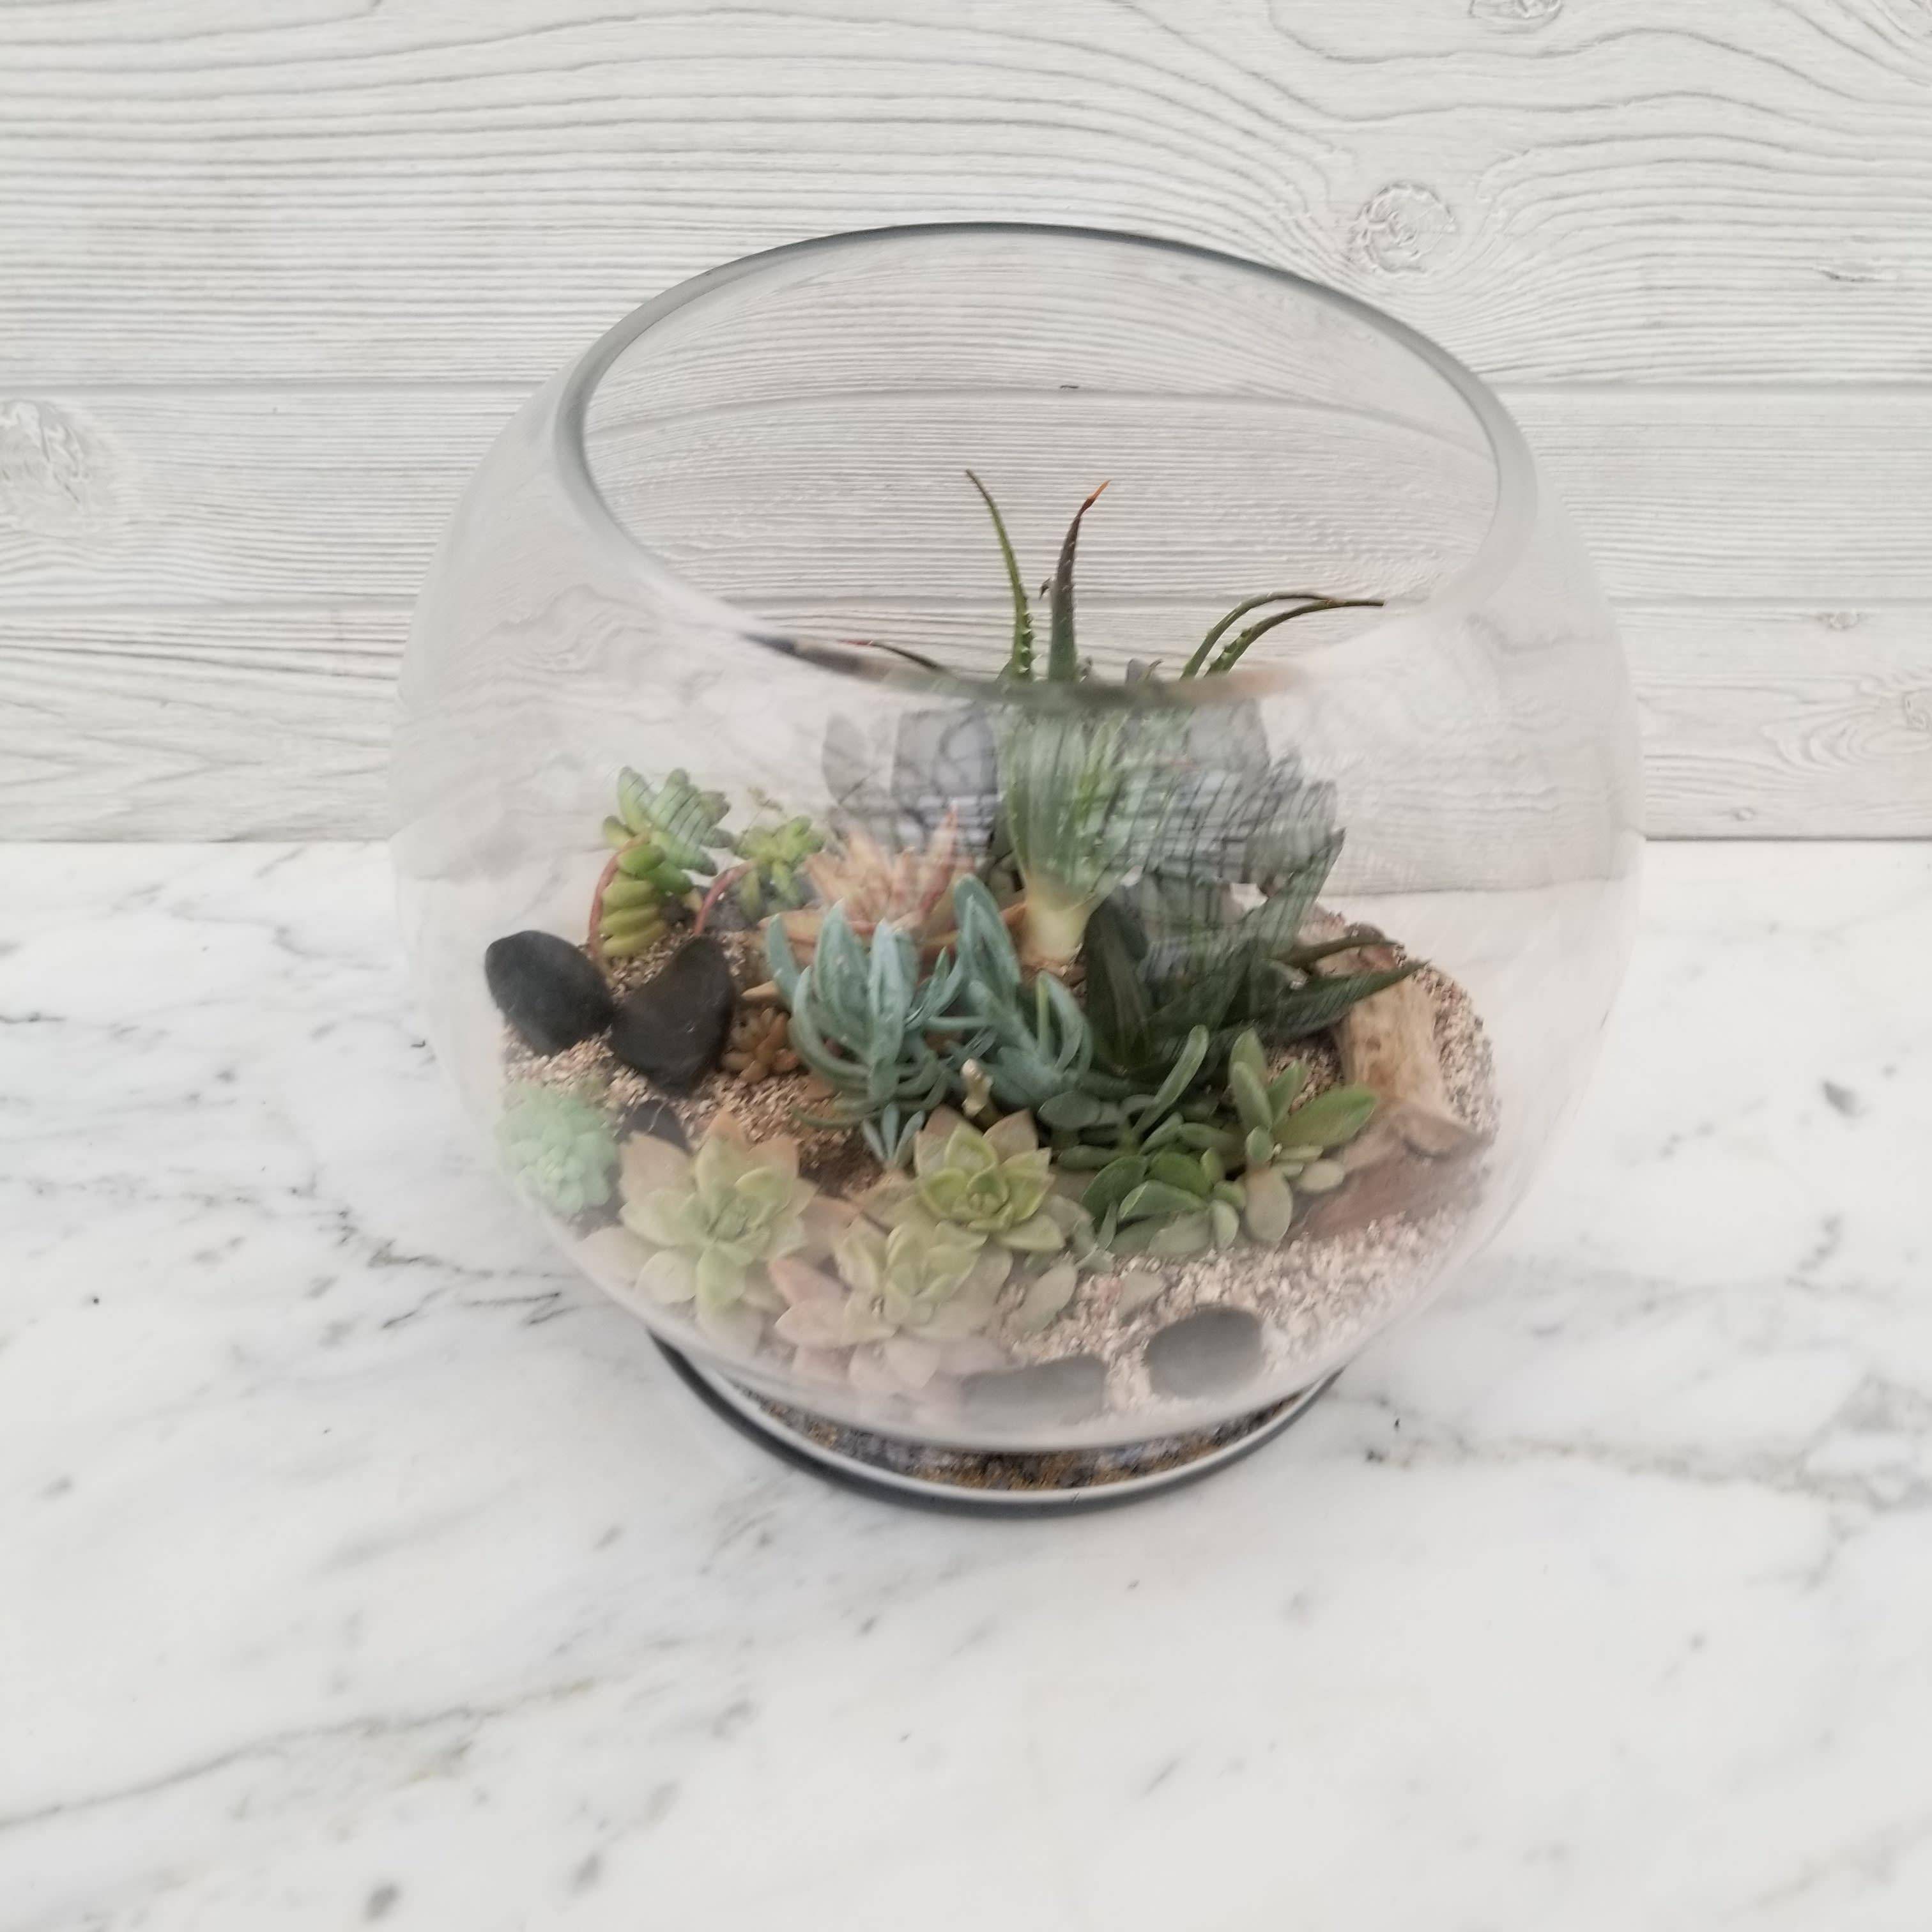 Succulent Terrarium Globe By West End Florist Garden Center